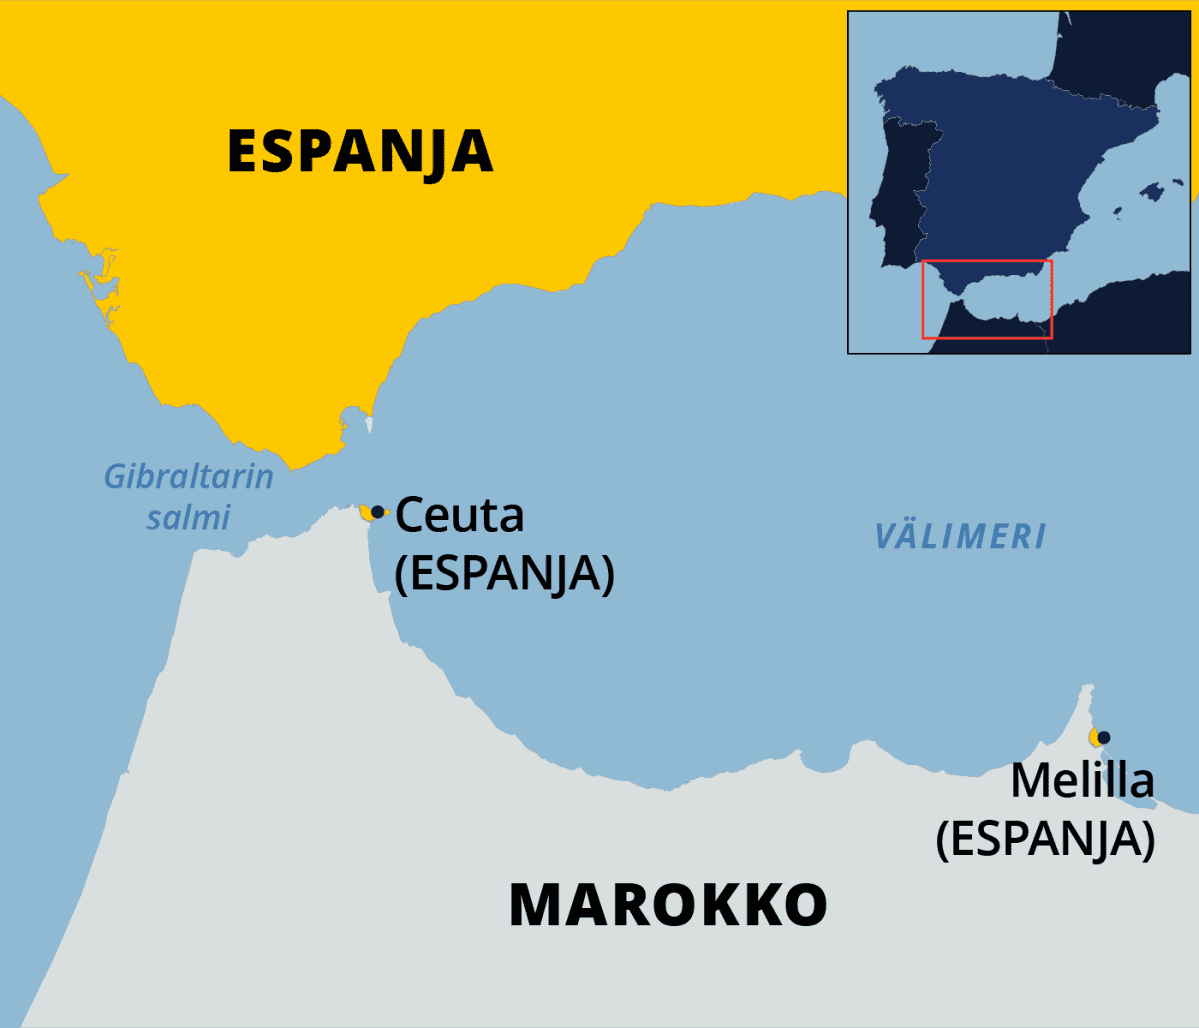 Kartta Gibraltarin salmesta.